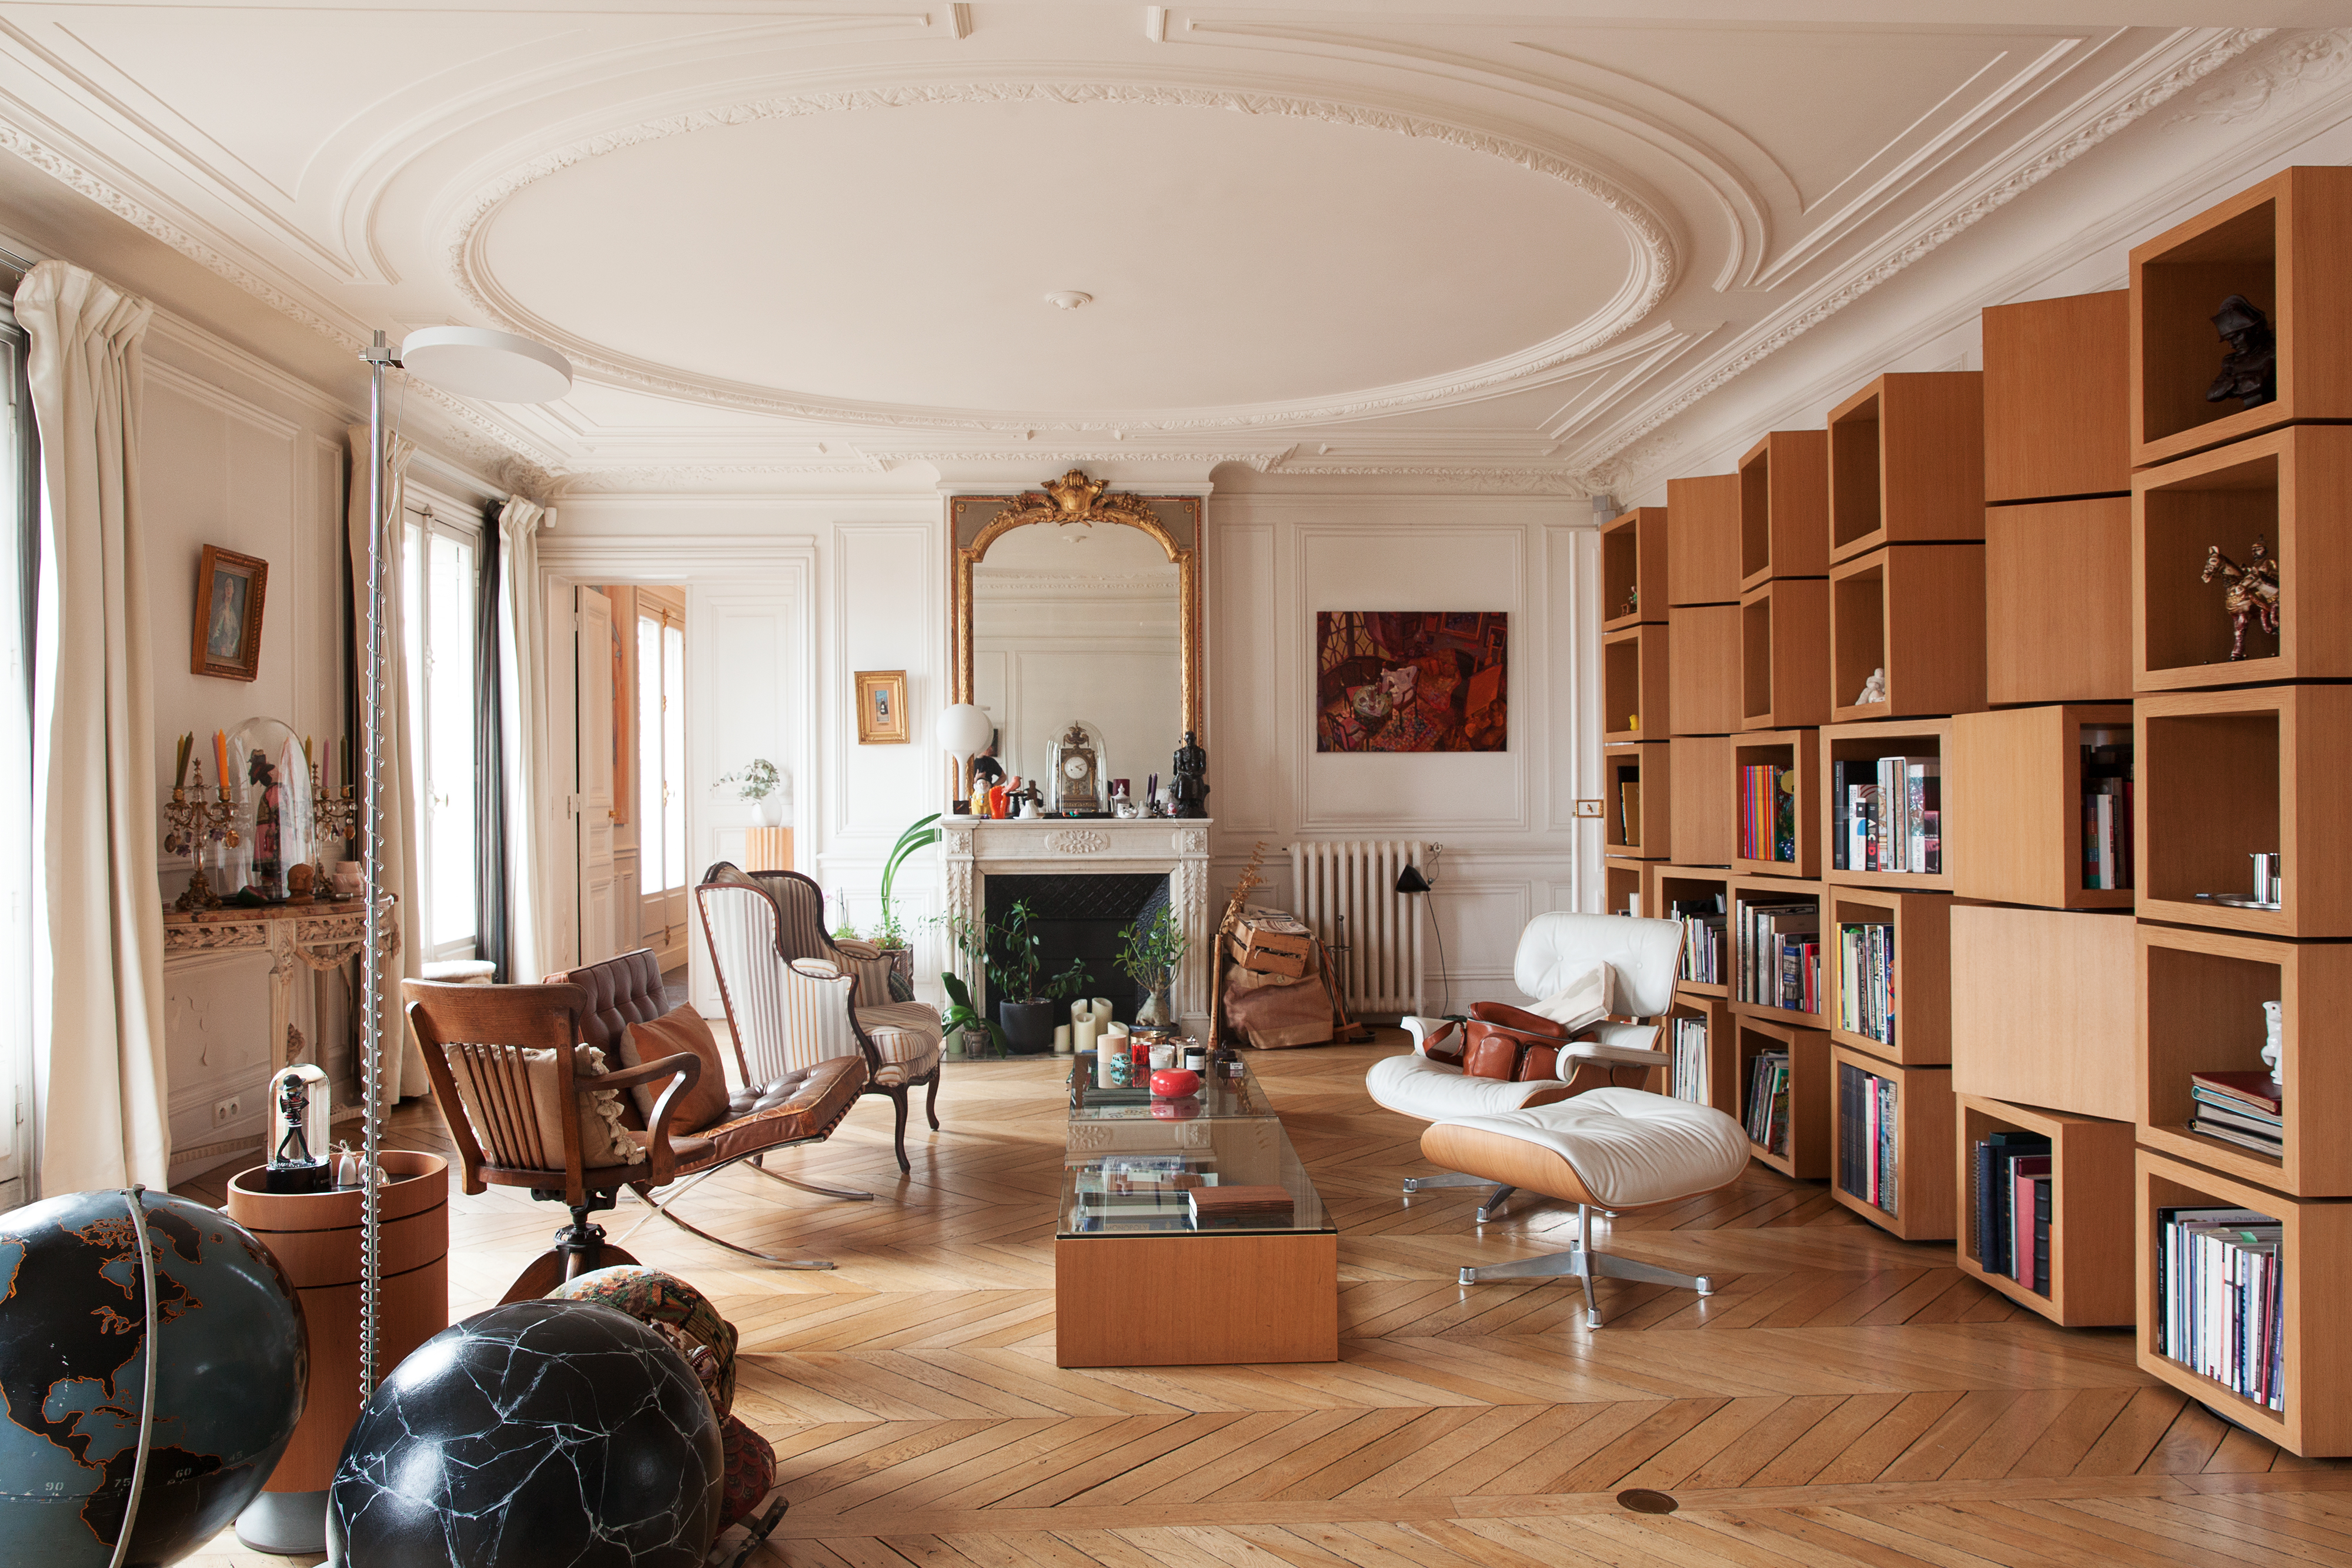 Salon – Edwina de Charette